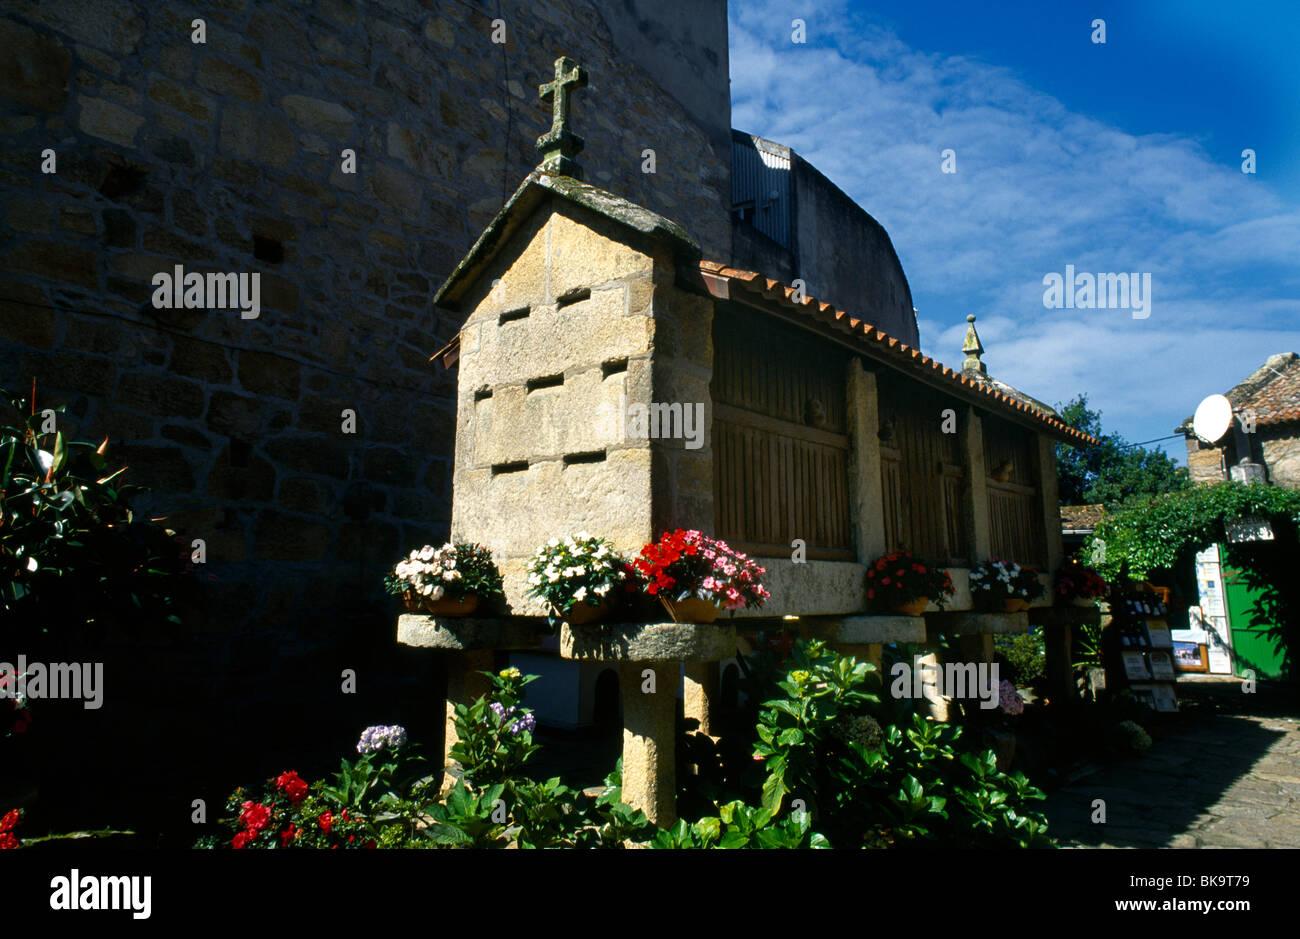 Galicia Spain Cambados Horreo Galician Grainstore - Stock Image